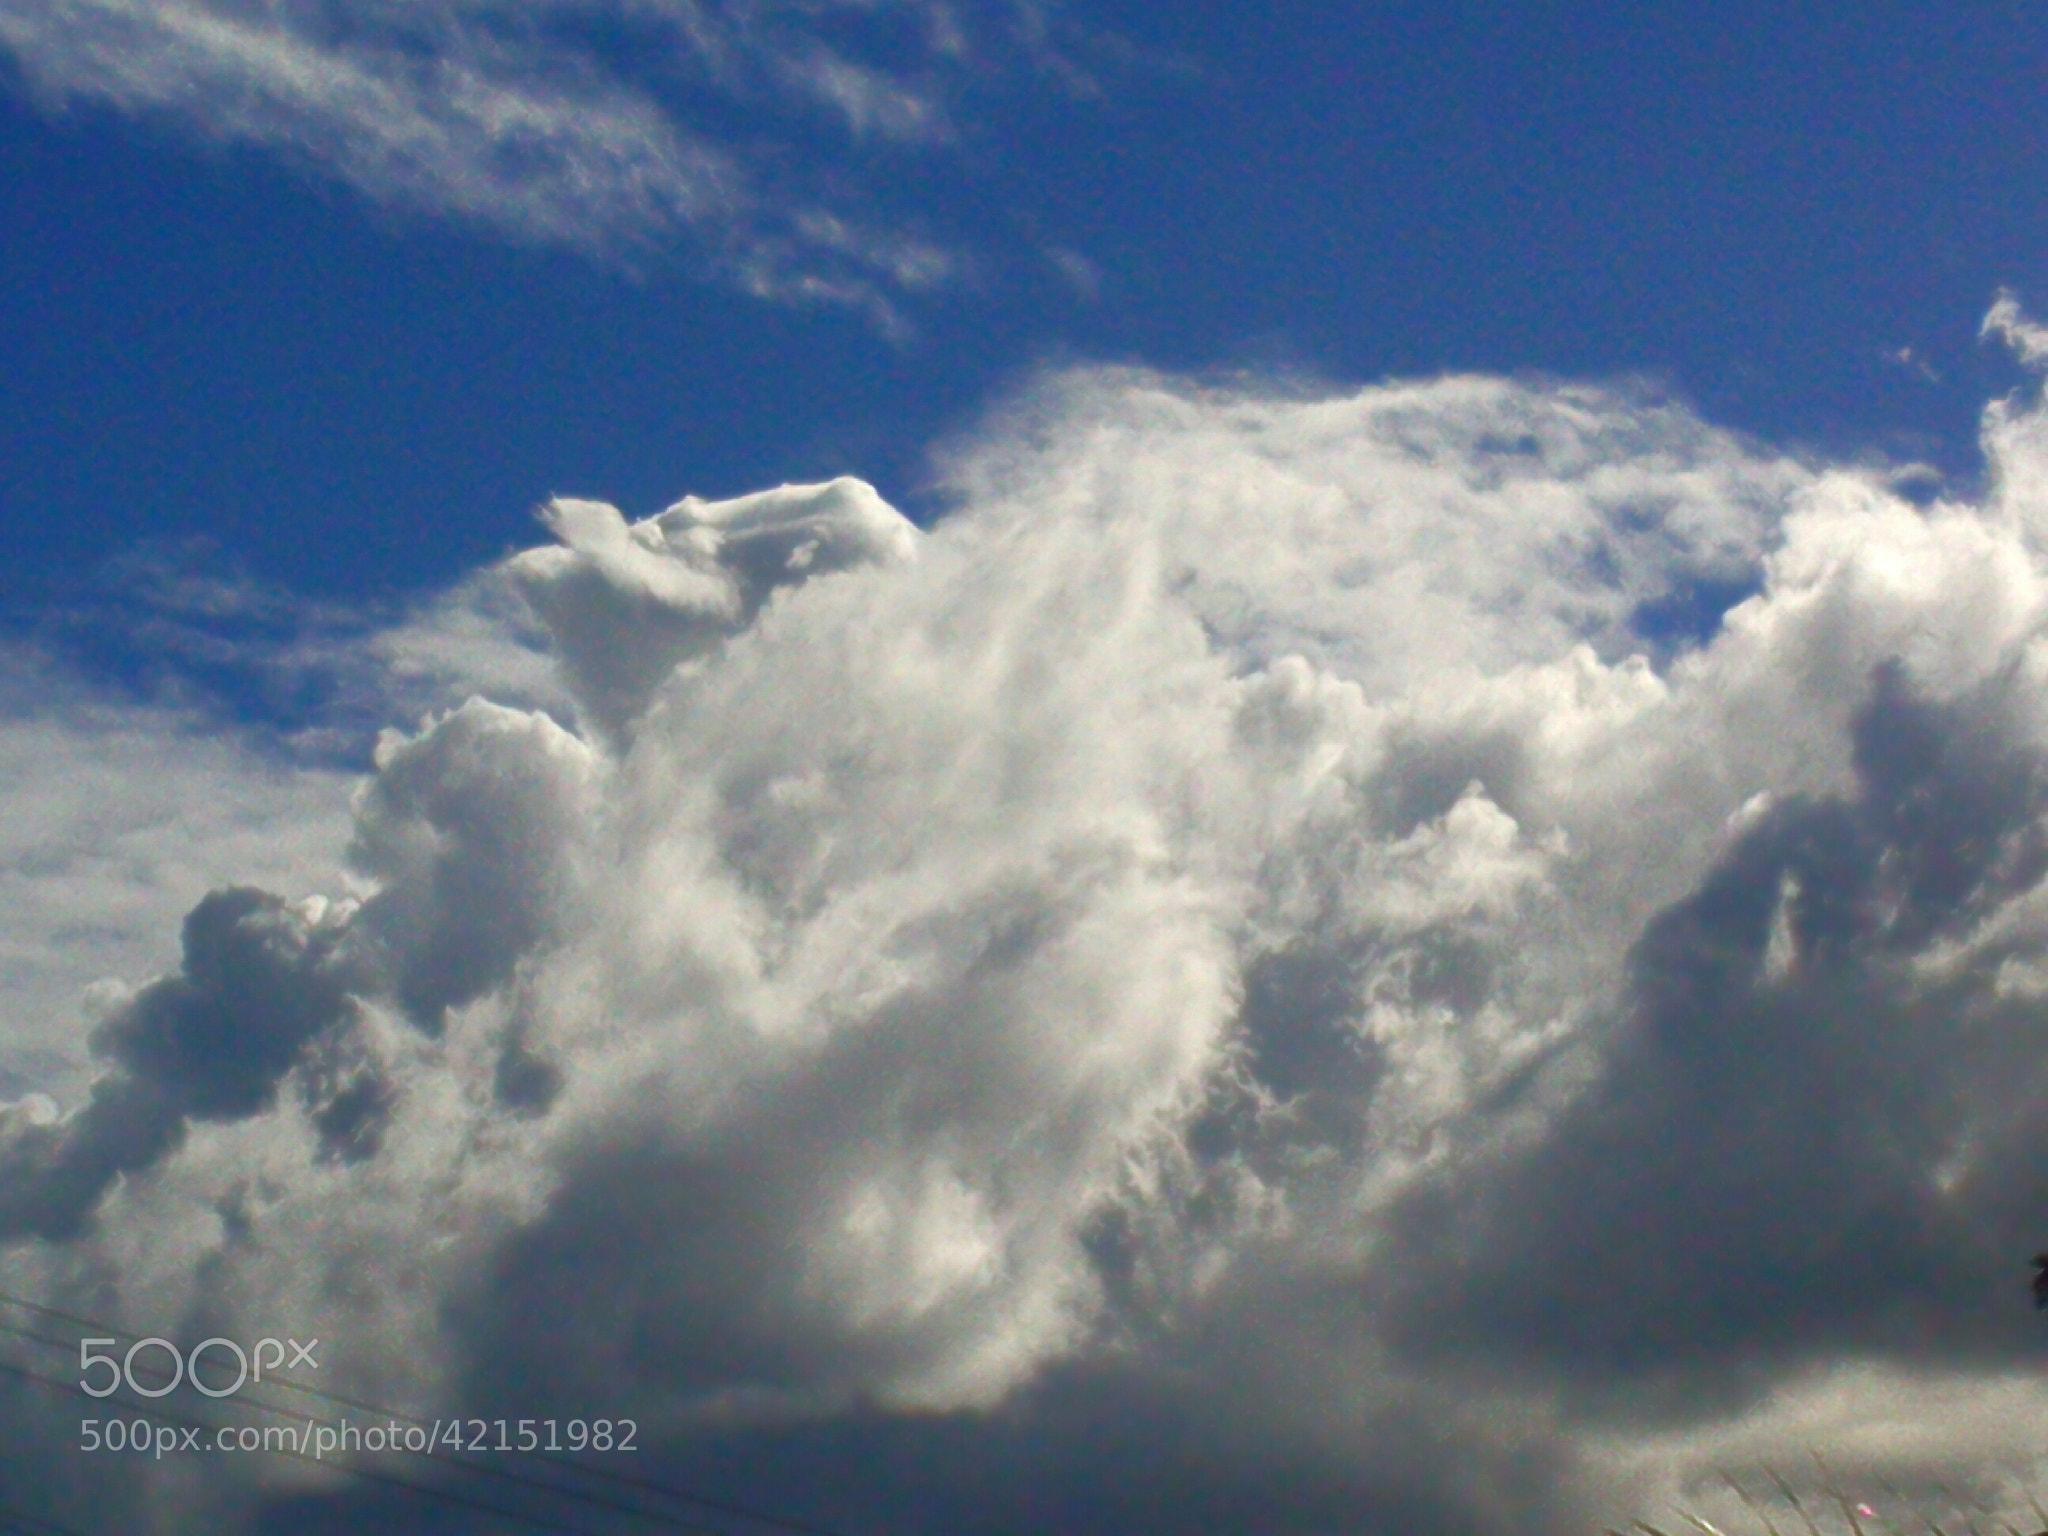 Photograph Cloud Blast by Saranyan Ravinthirakumaran on 500px